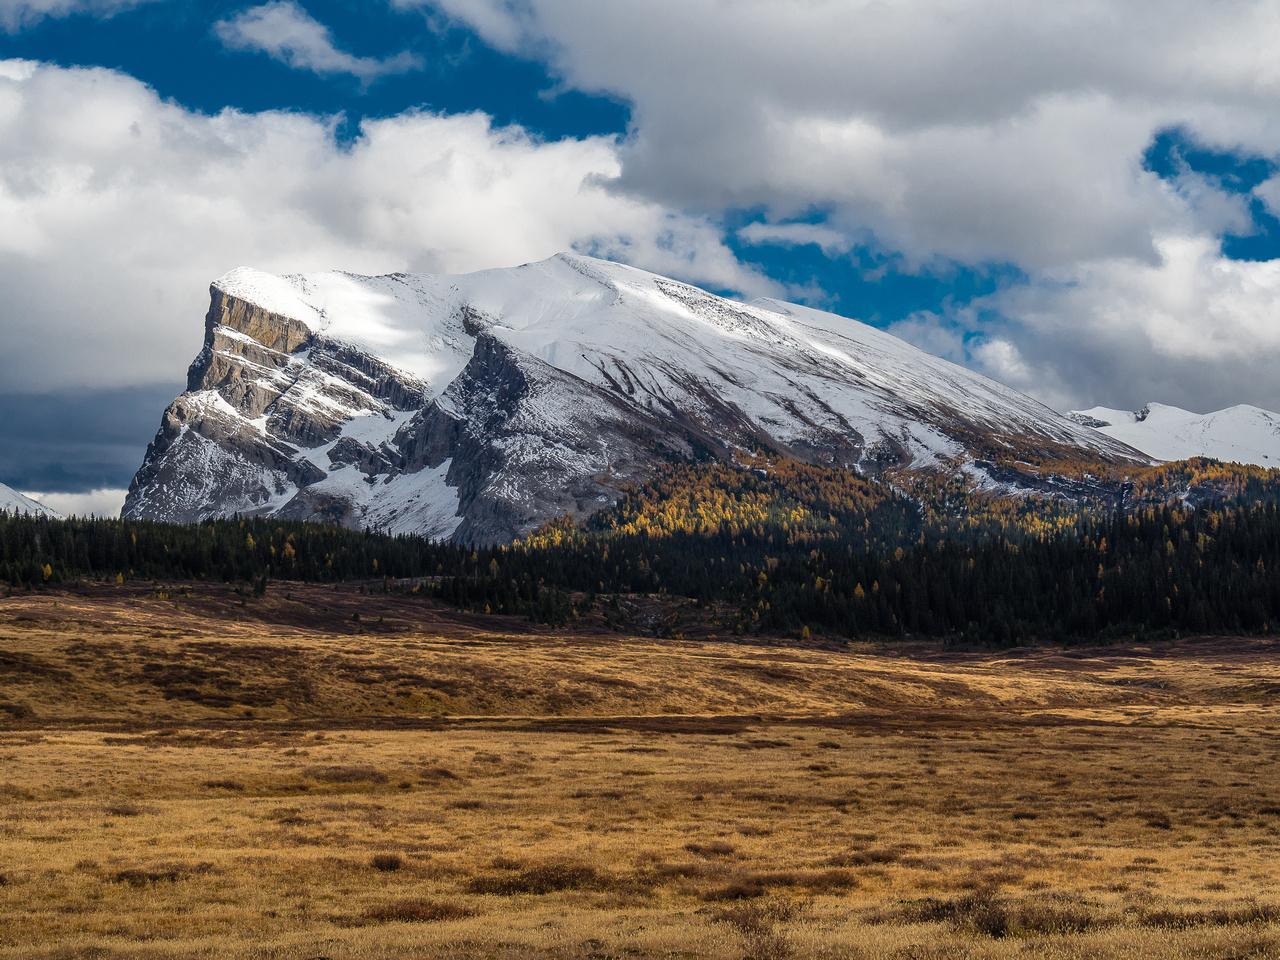 Cascade Rock / Mount Cautley.